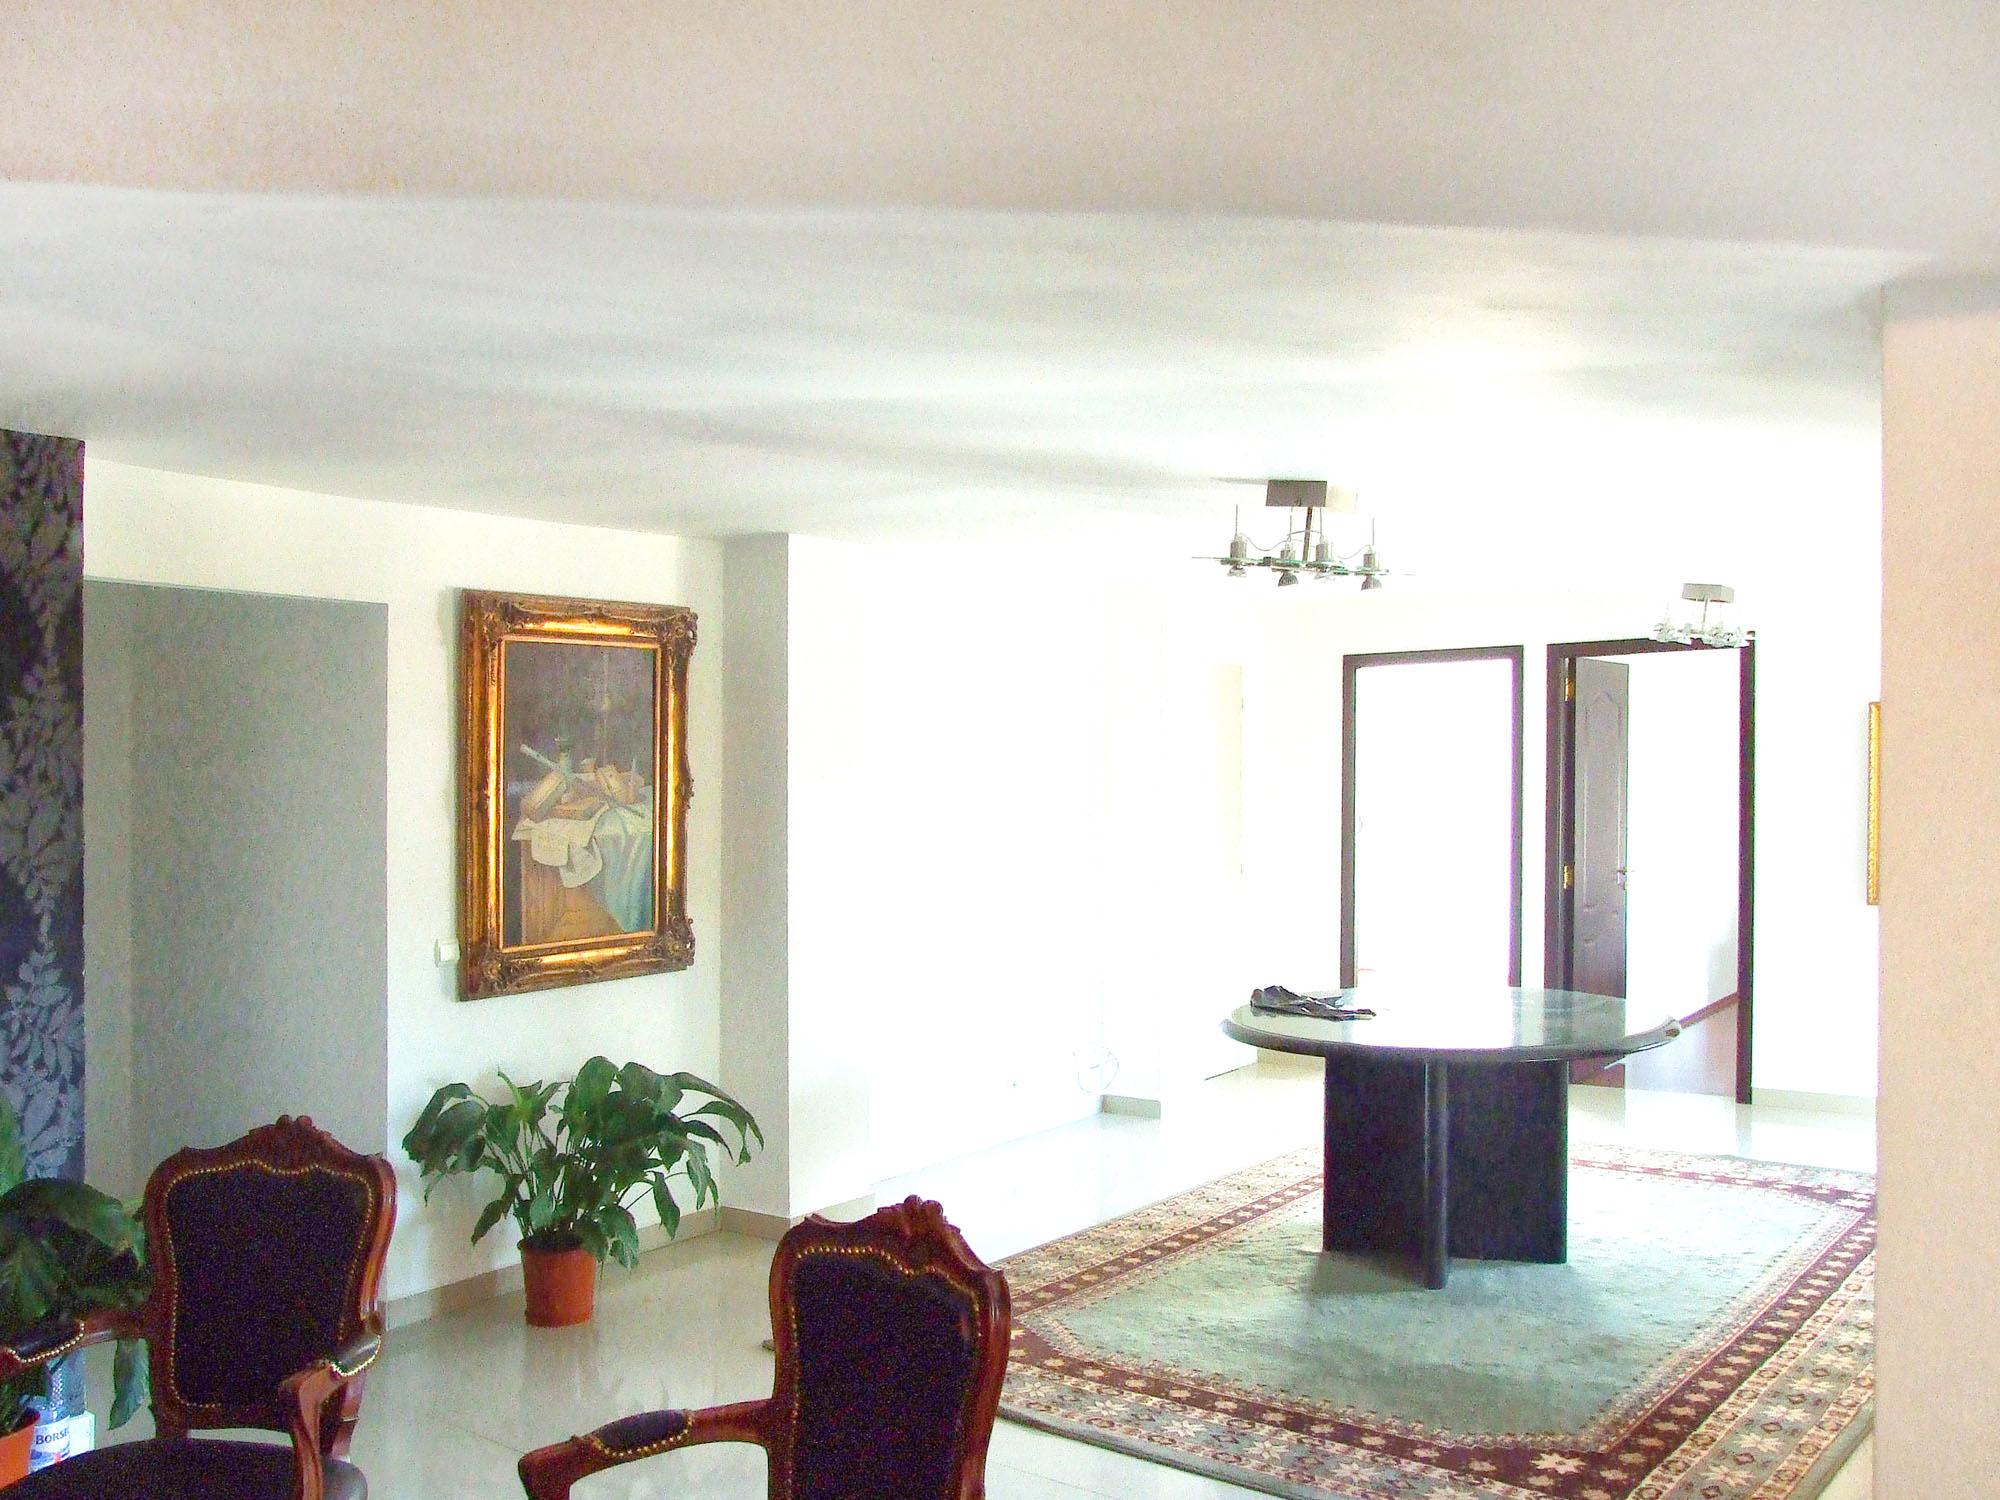 https://ahe-ro.s3.amazonaws.com/2858/casa_cu_ferestre_venetiene_9__1.jpg